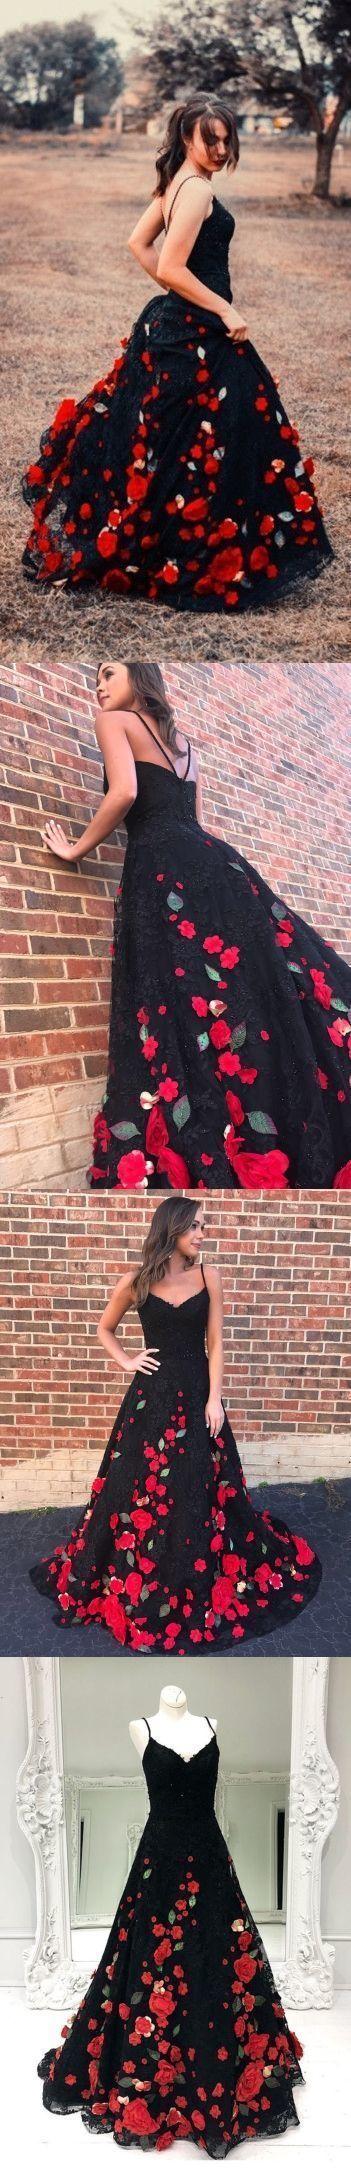 4f3c92a1c679f Black Prom Dresses Spaghetti Straps Red Flowers Long Prom Dress Sexy Evening